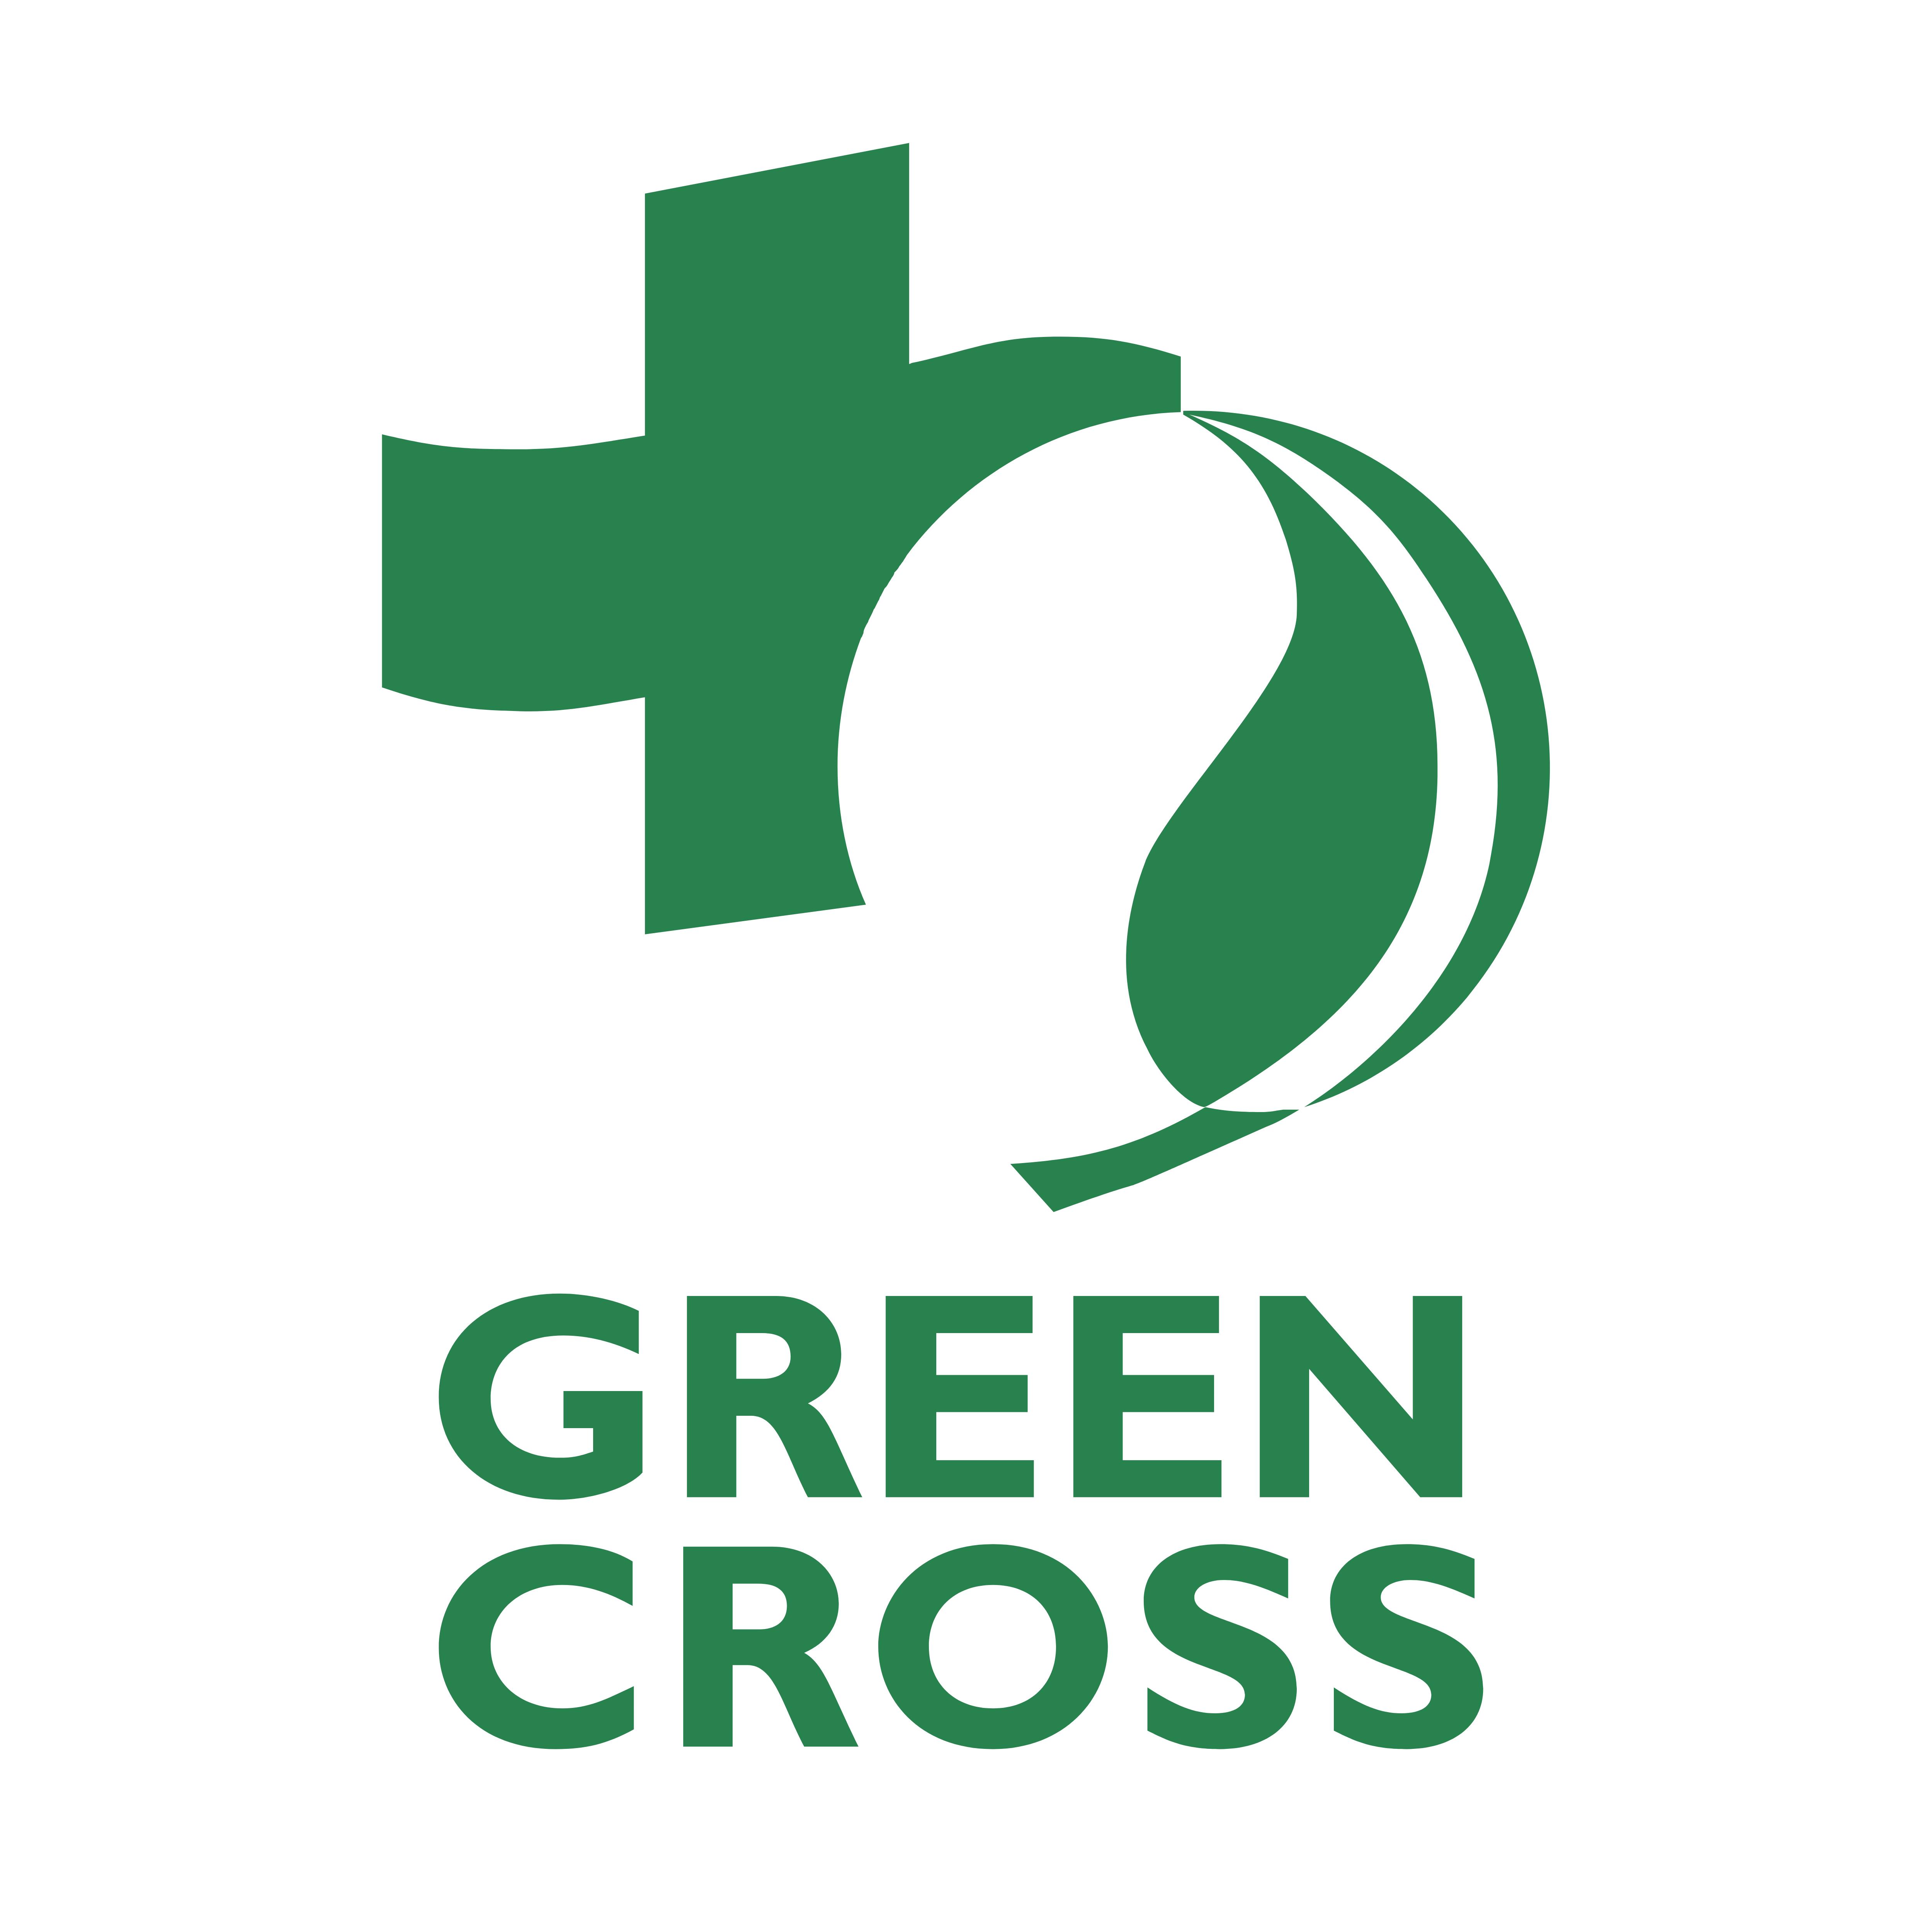 Green Cross Logos Download